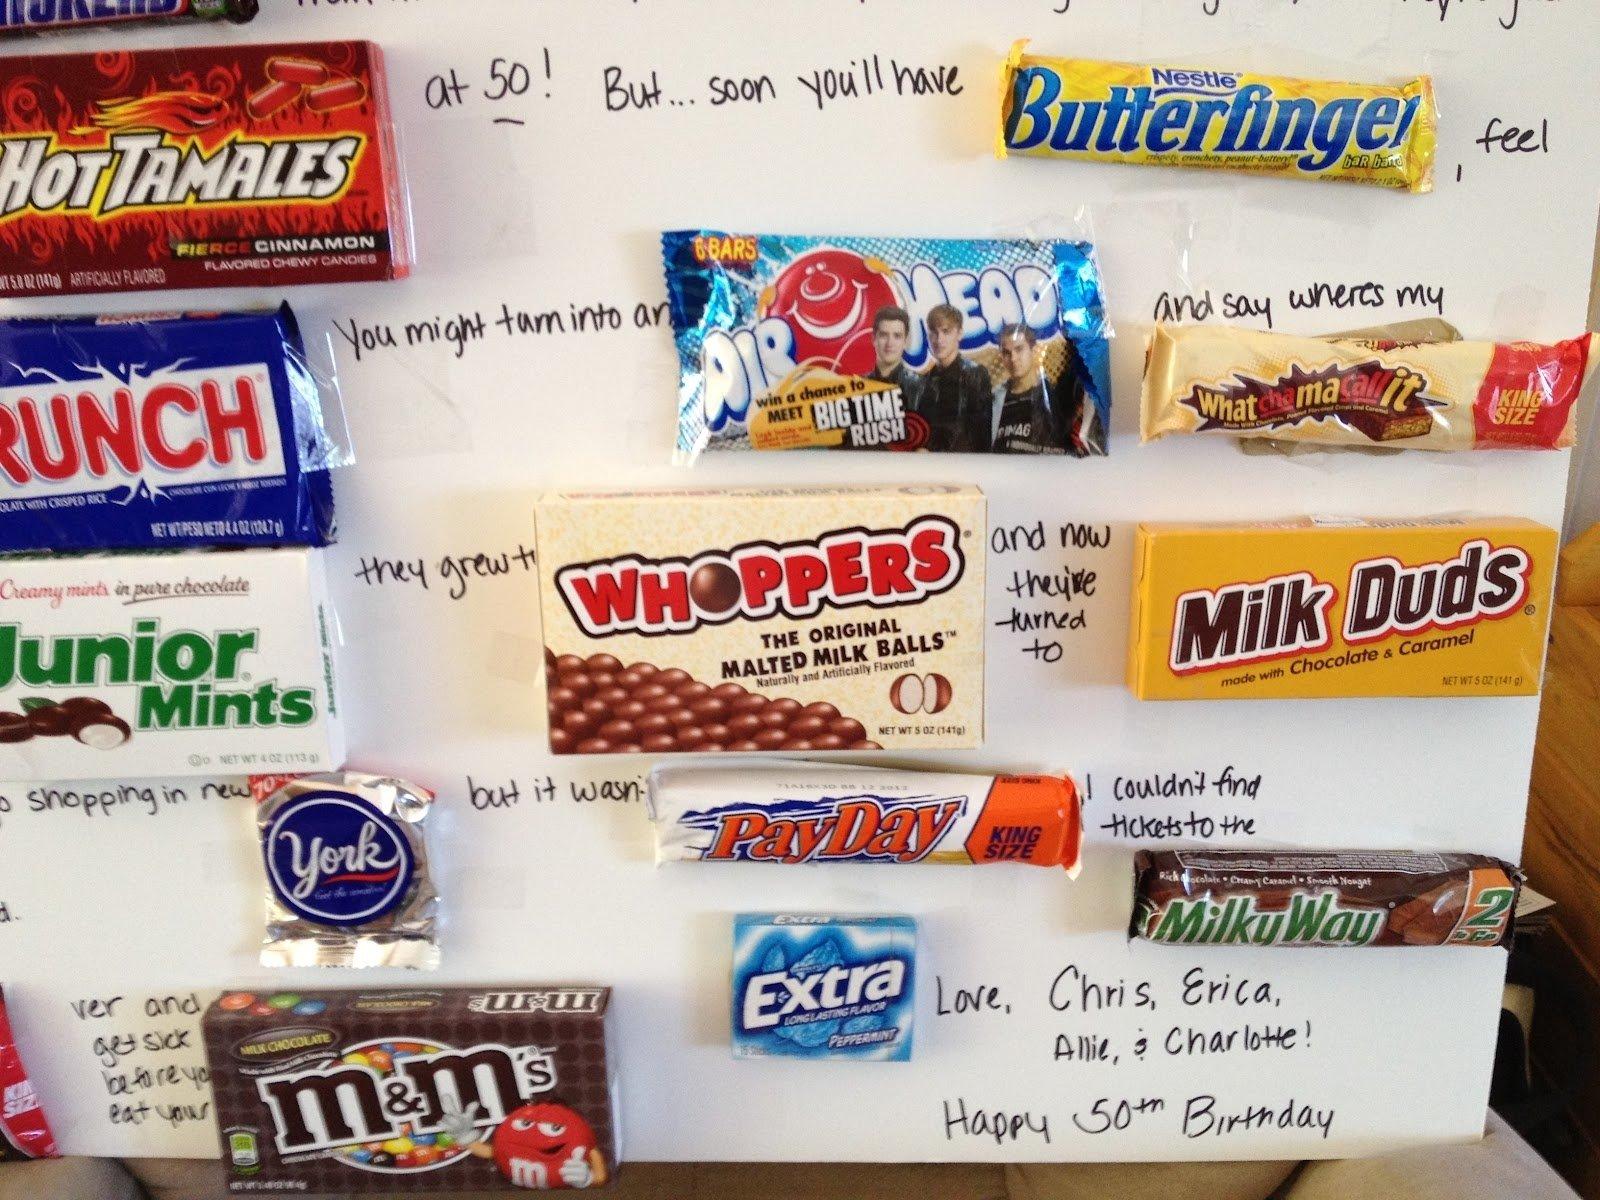 10 Unique Gift Ideas For Mom Birthday 40th birthday ideas 50th birthday present ideas for your mom 10 2021